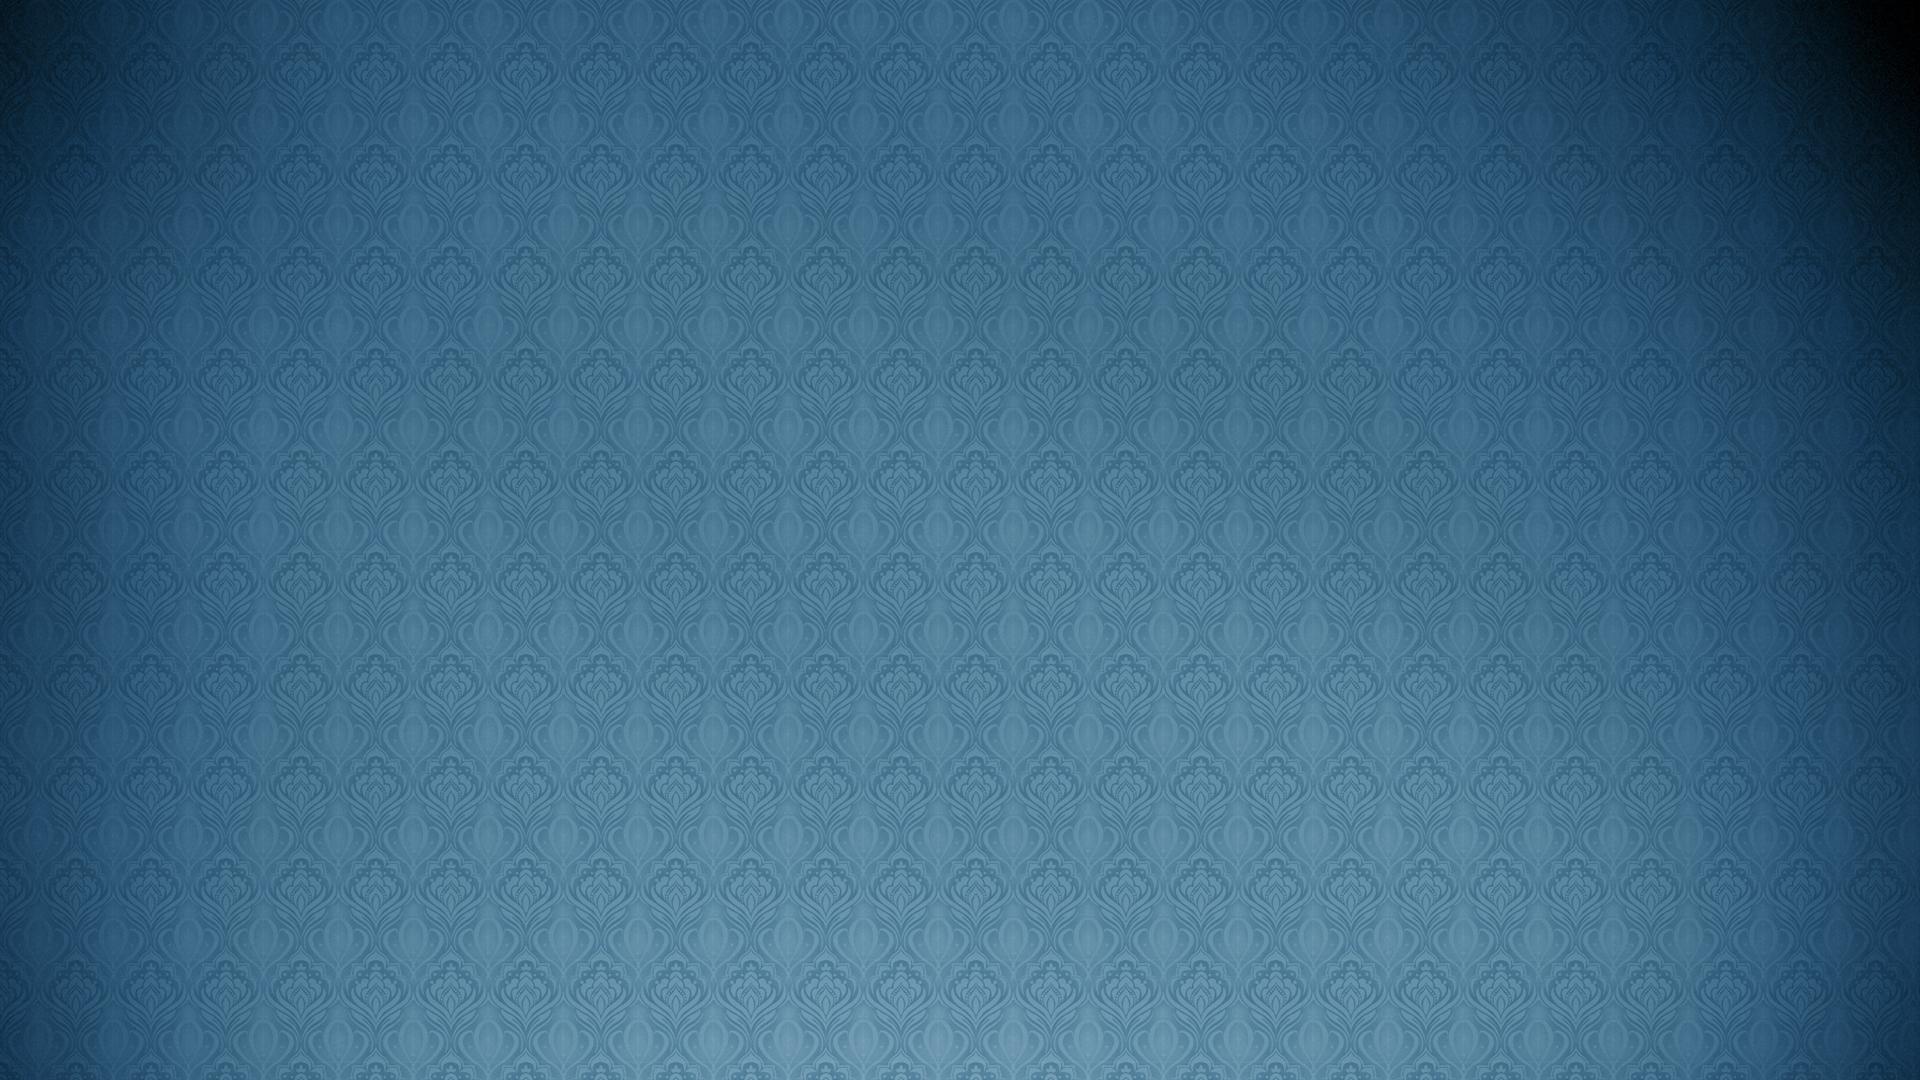 Download simple pattern wallpaper HD wallpaper 1920x1080